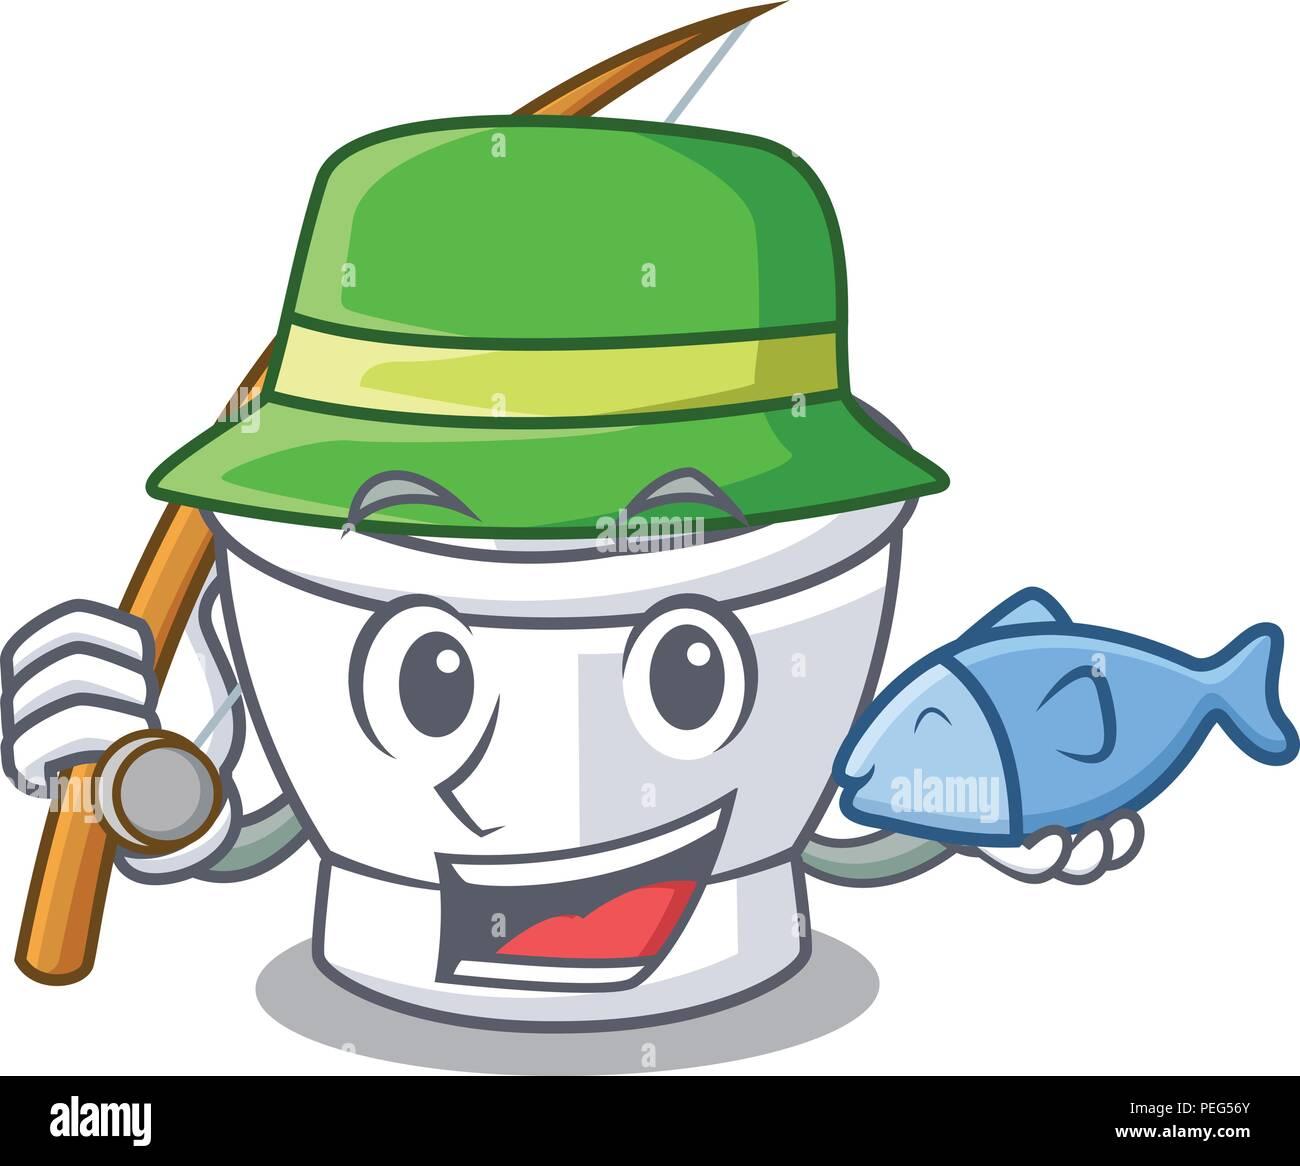 Fishing mortar mascot cartoon style - Stock Vector